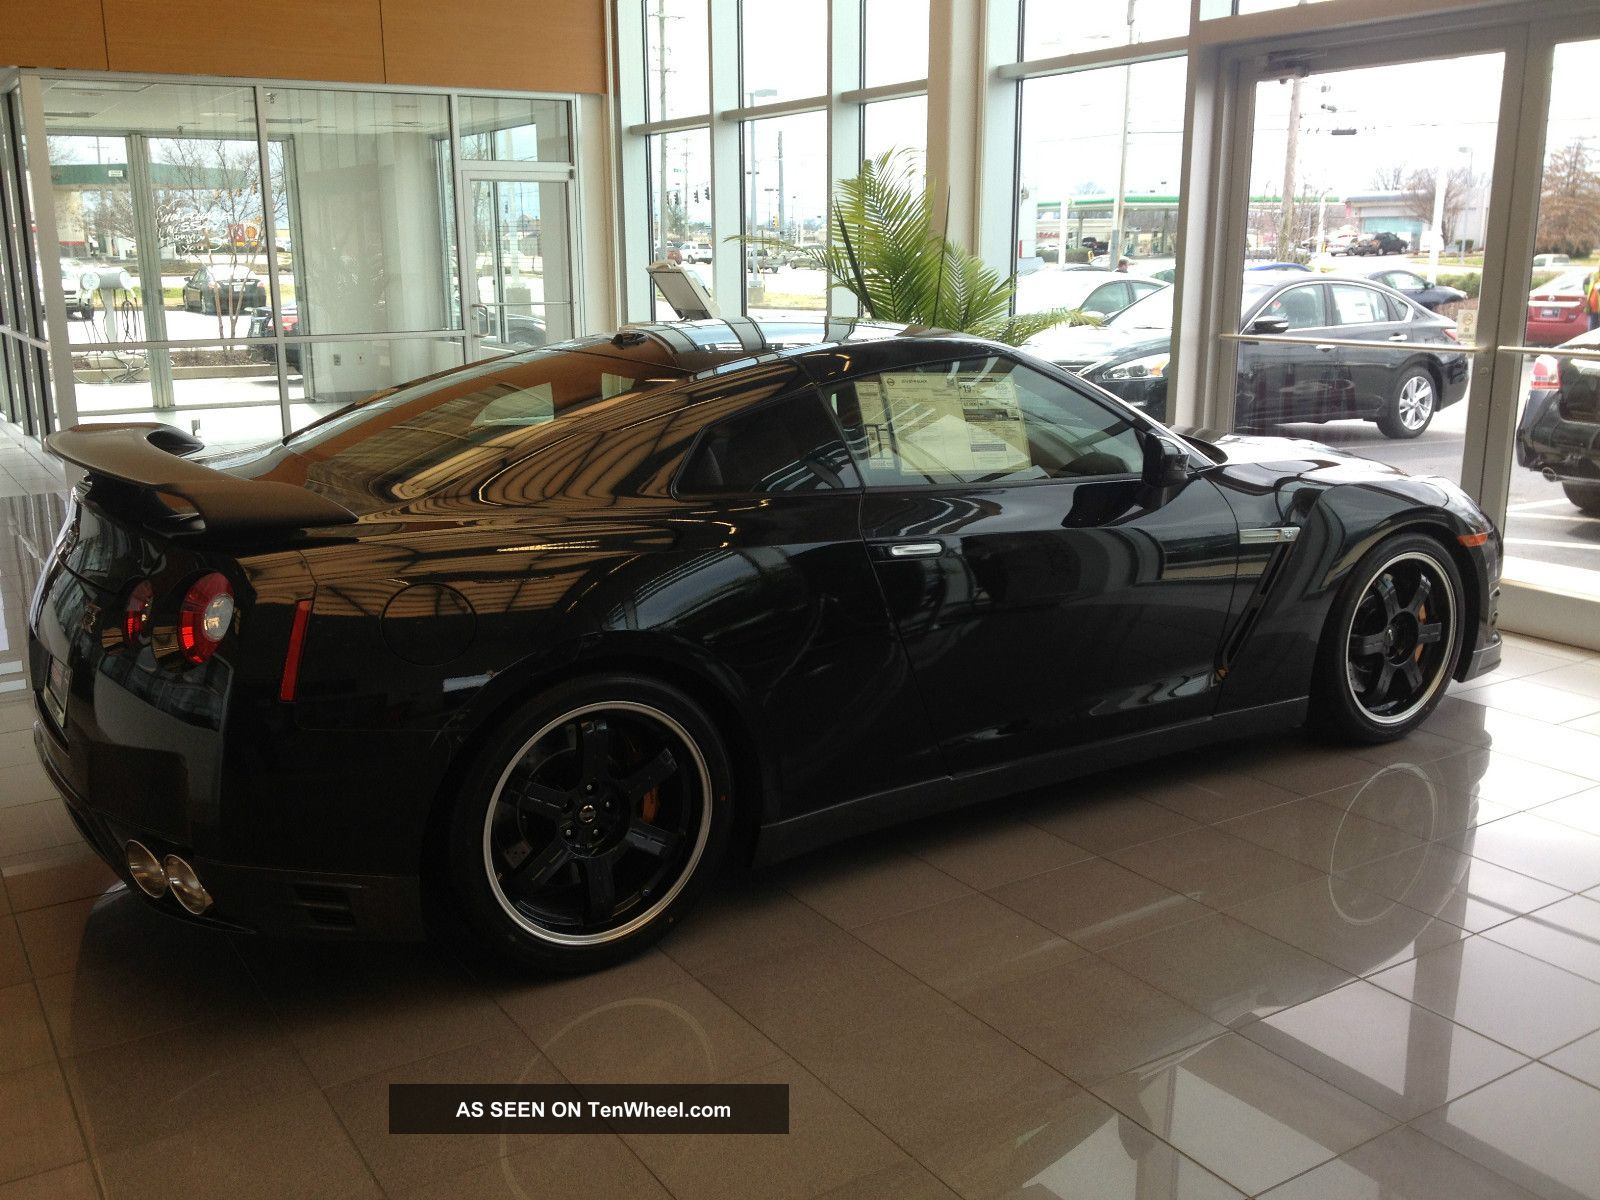 2014 Nissan Gt - R Black Edition GT-R photo